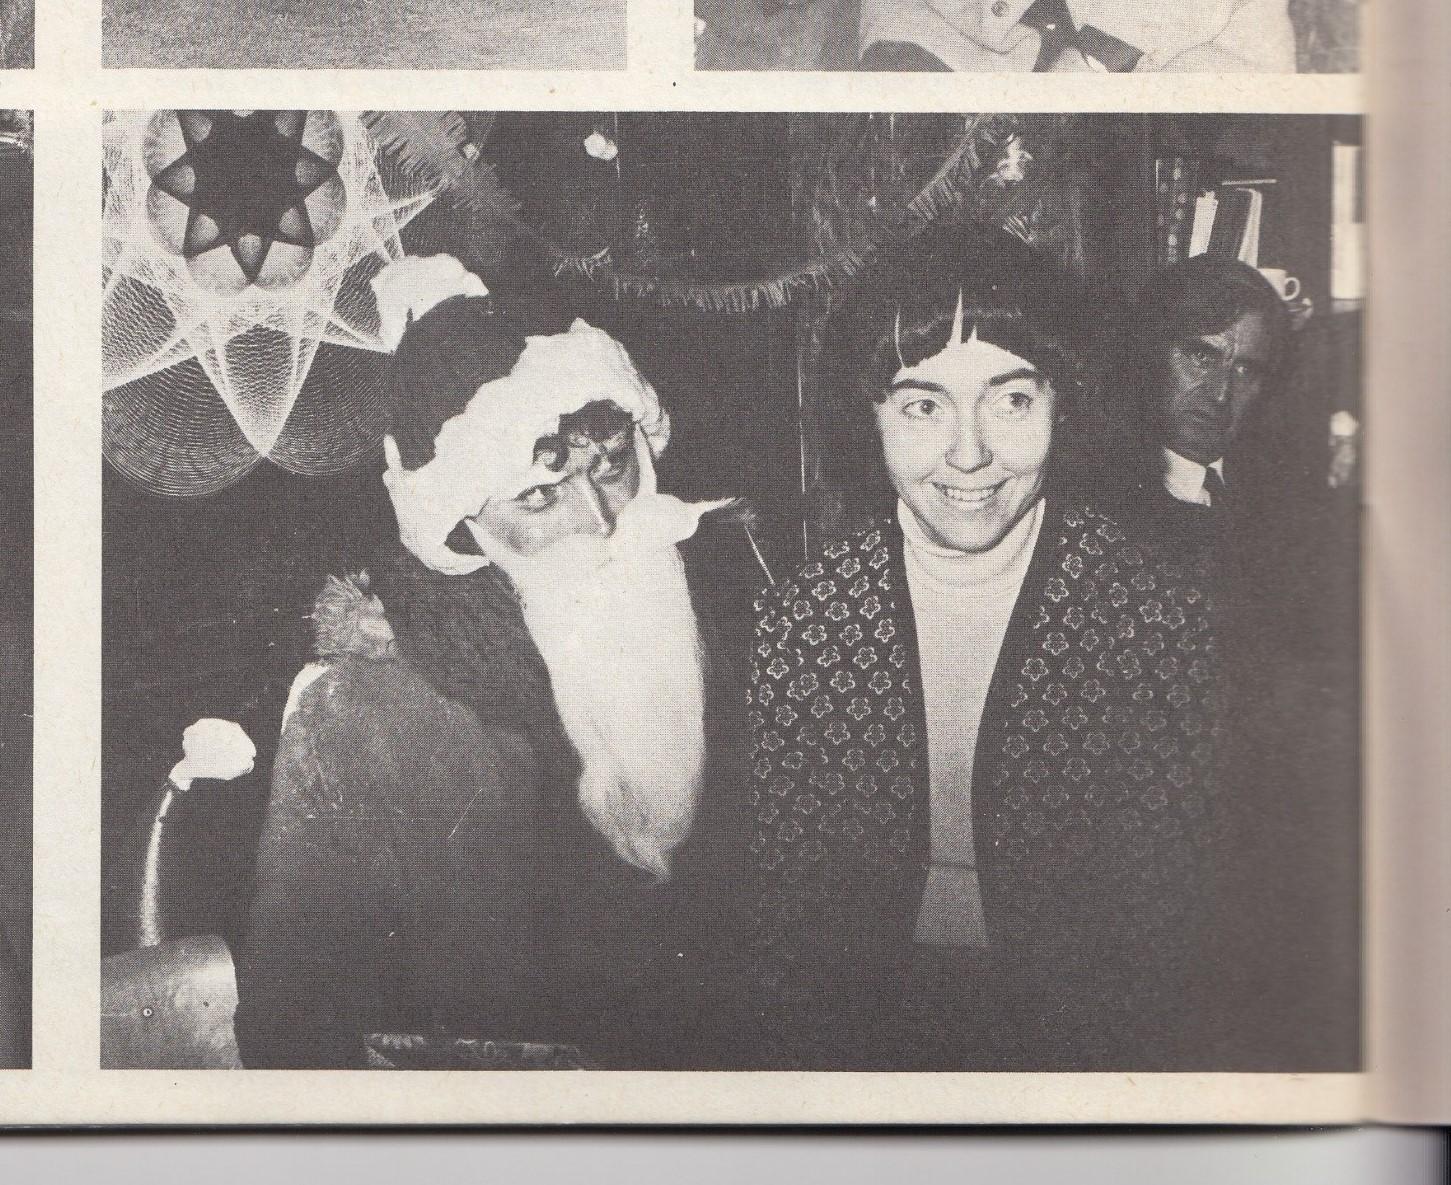 Christmas at the English School 1972